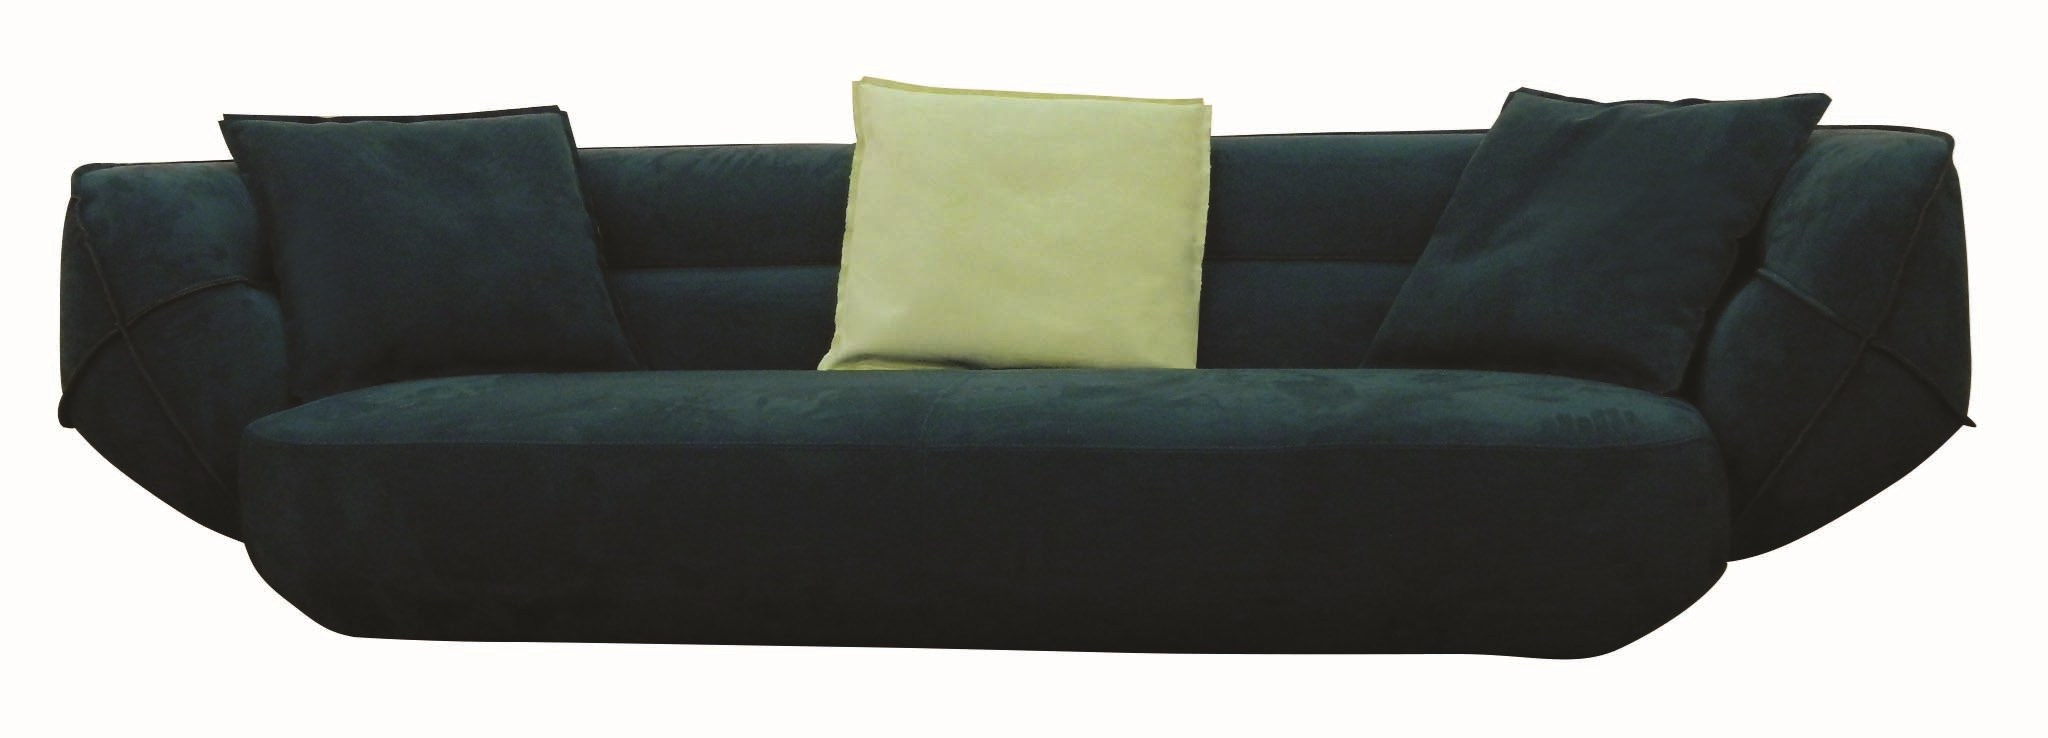 Canap rembourr en tissu ace by roche bobois design - Canapes roche bobois tissu ...